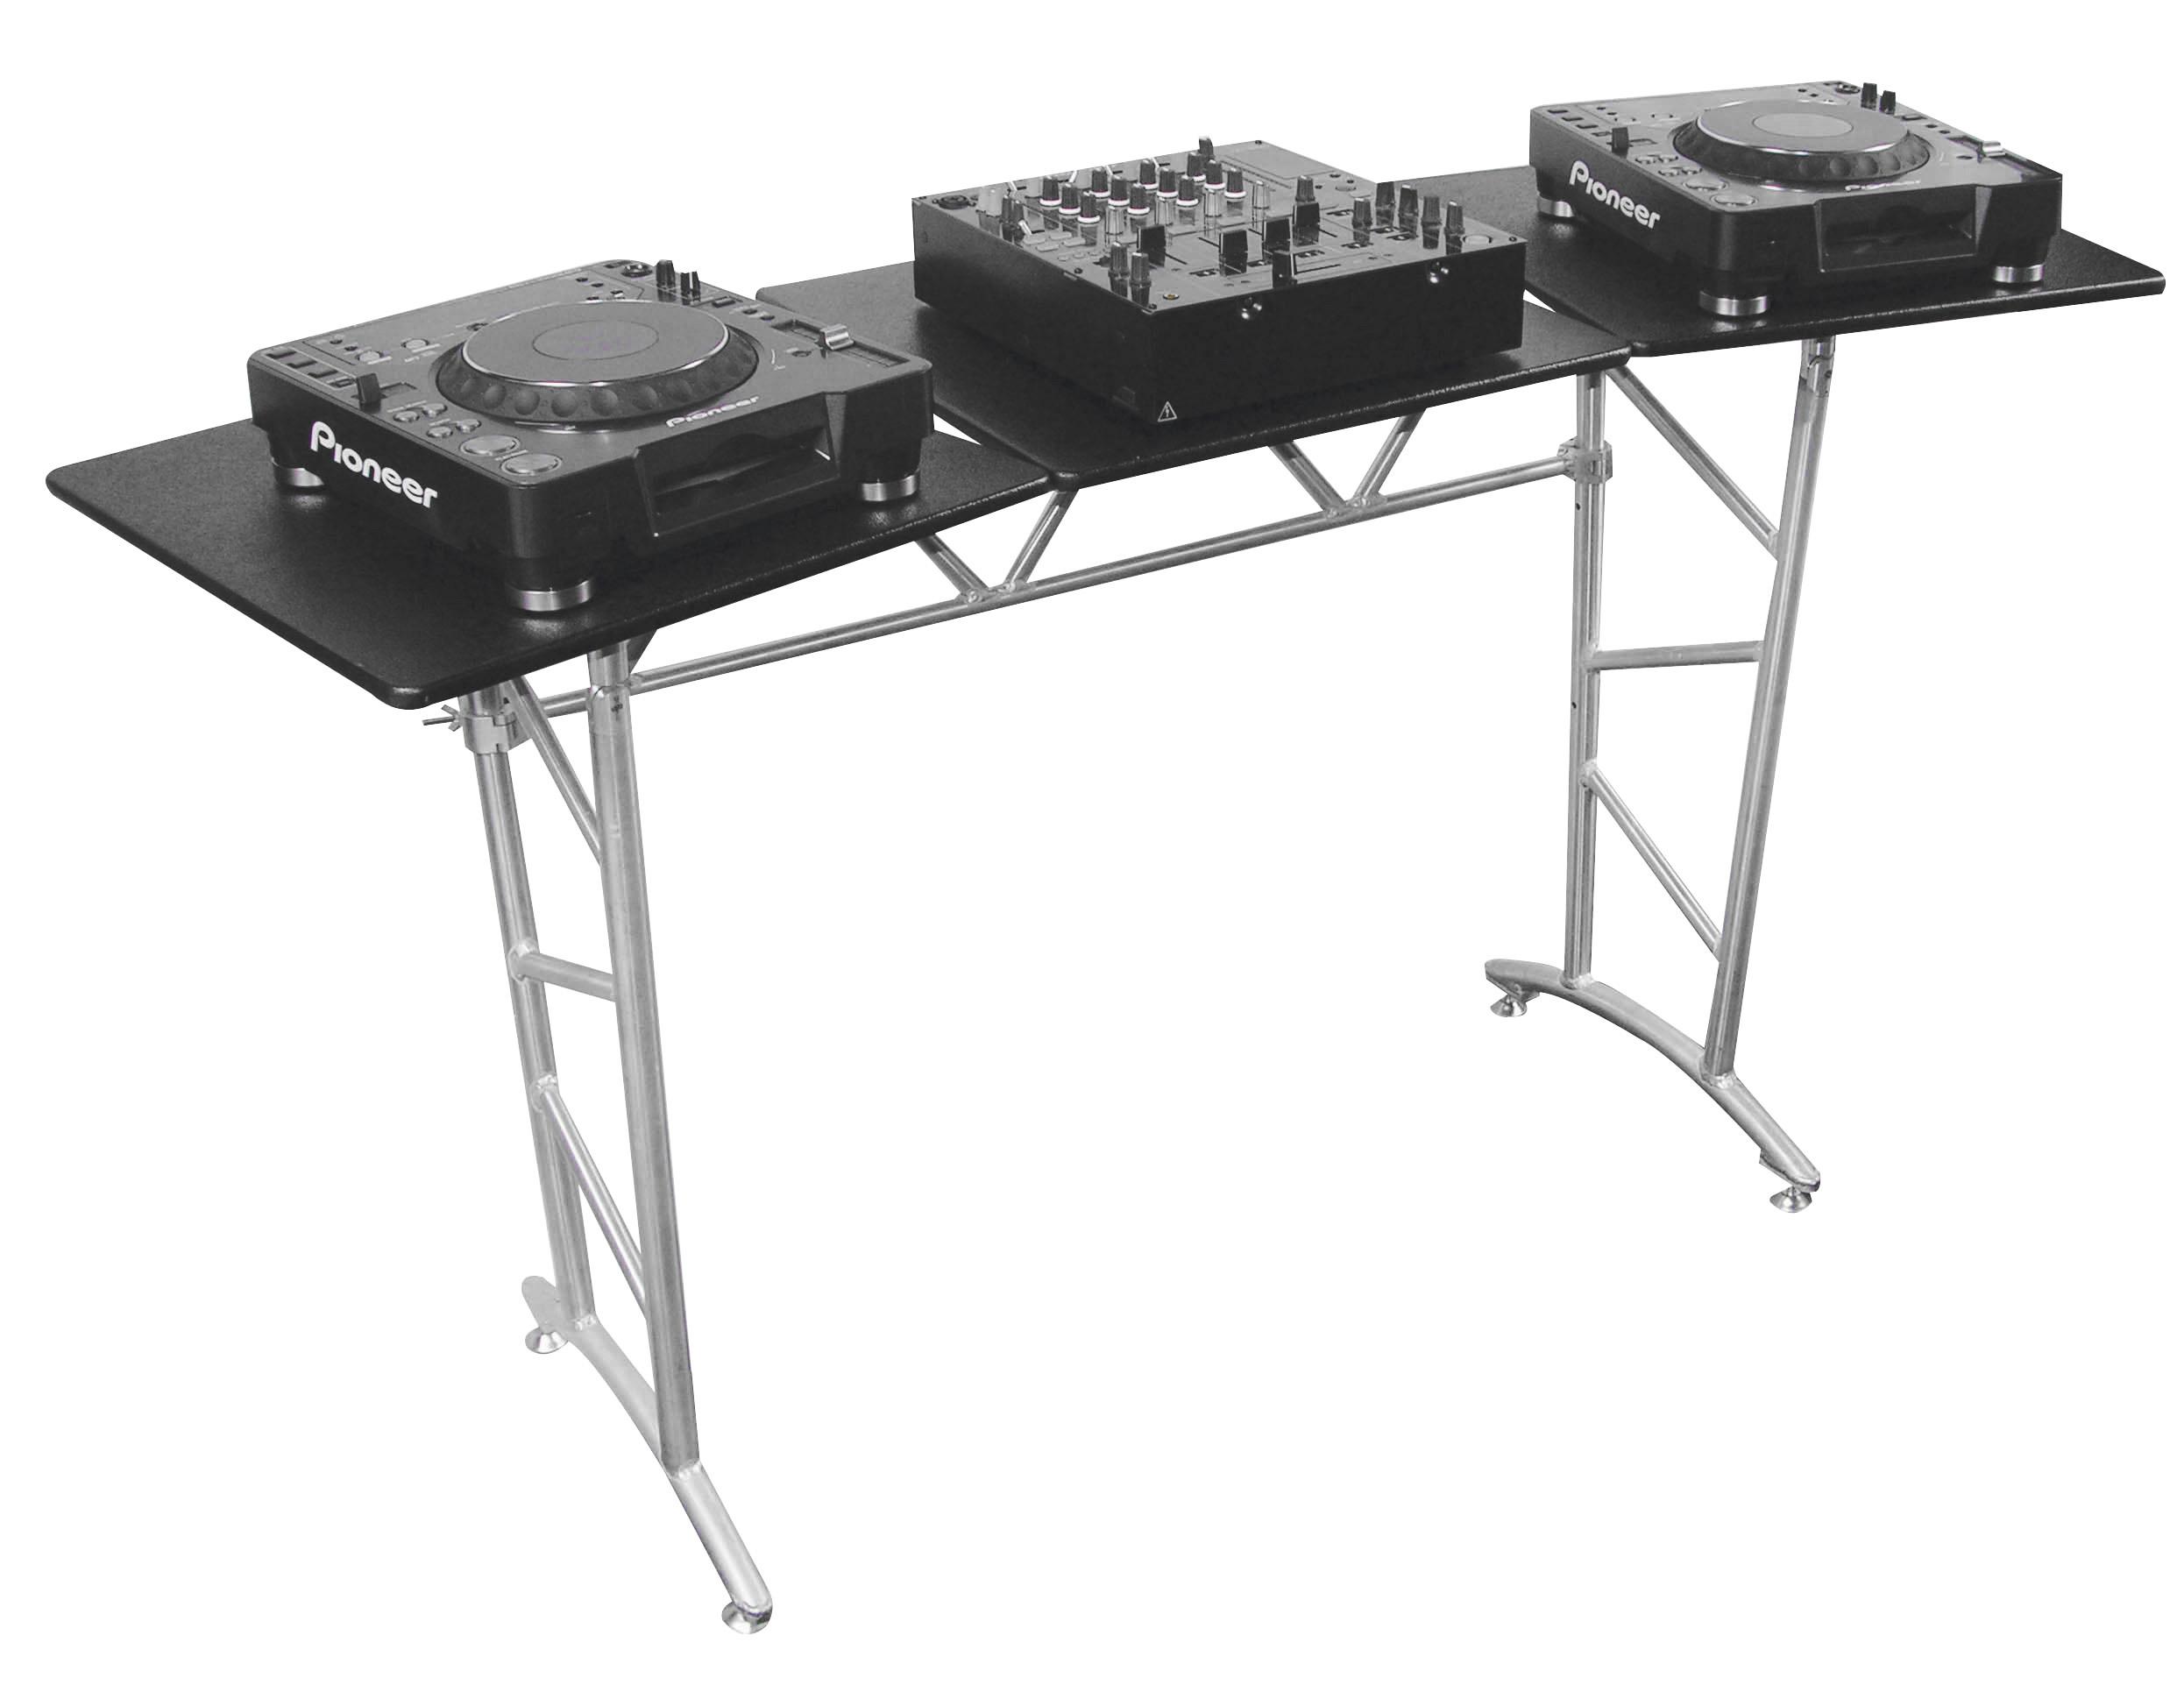 Odyssey Case ATT2 - Truss Table, Diamond Textured with Swivel Side Platforms and Folding Legs